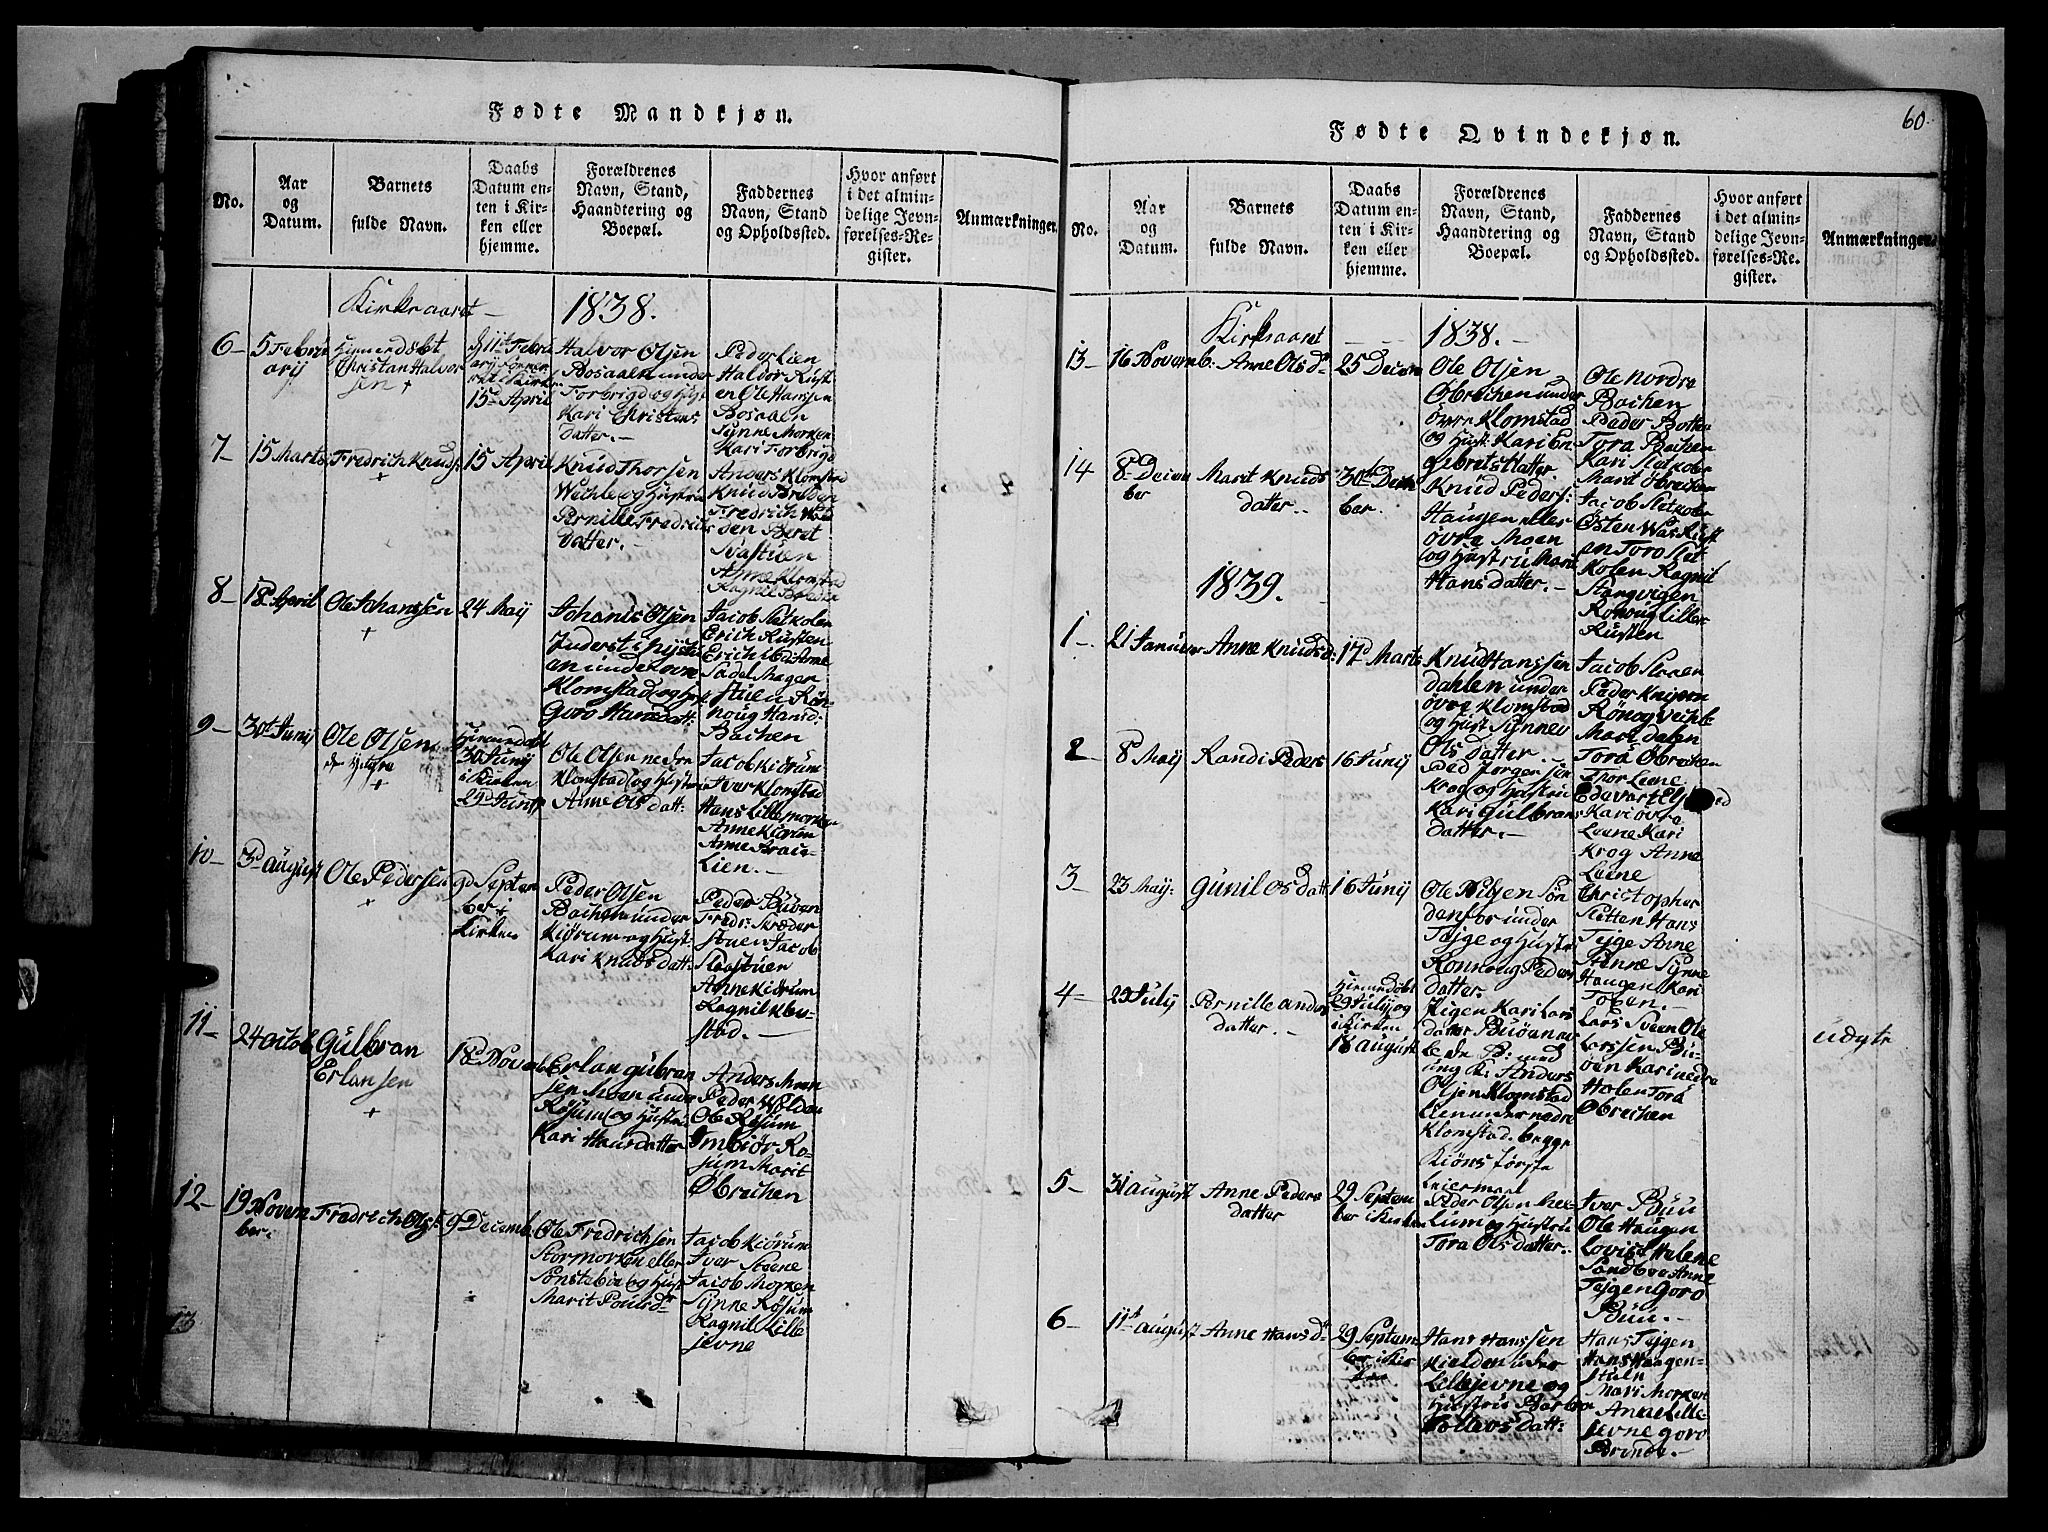 SAH, Fron prestekontor, H/Ha/Hab/L0002: Klokkerbok nr. 2, 1816-1850, s. 60